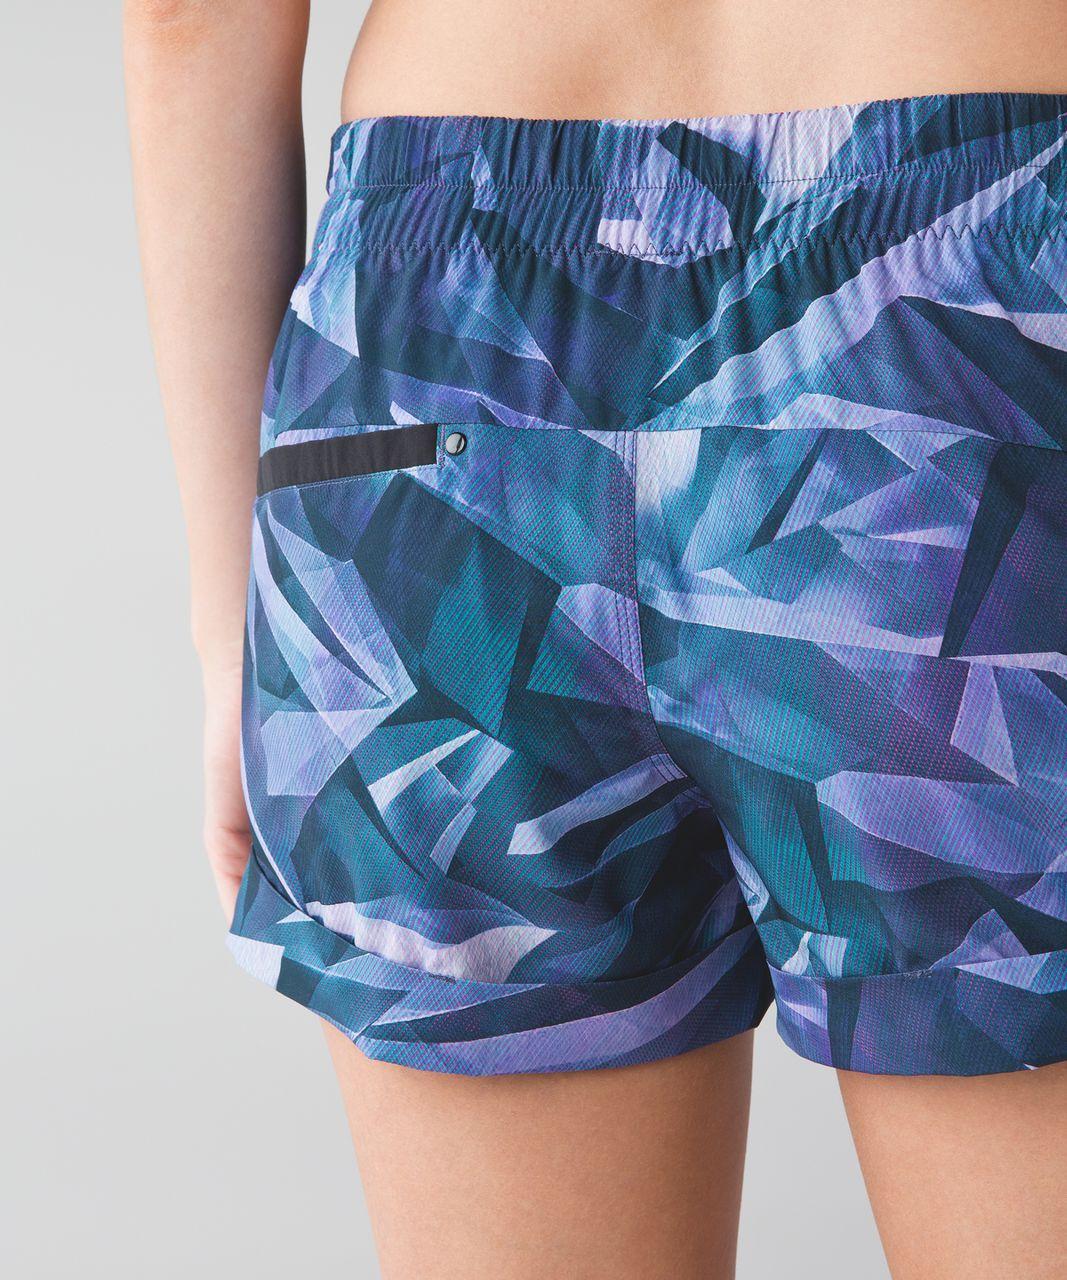 Lululemon Spring Break Away Short - Pretty Prism Multi